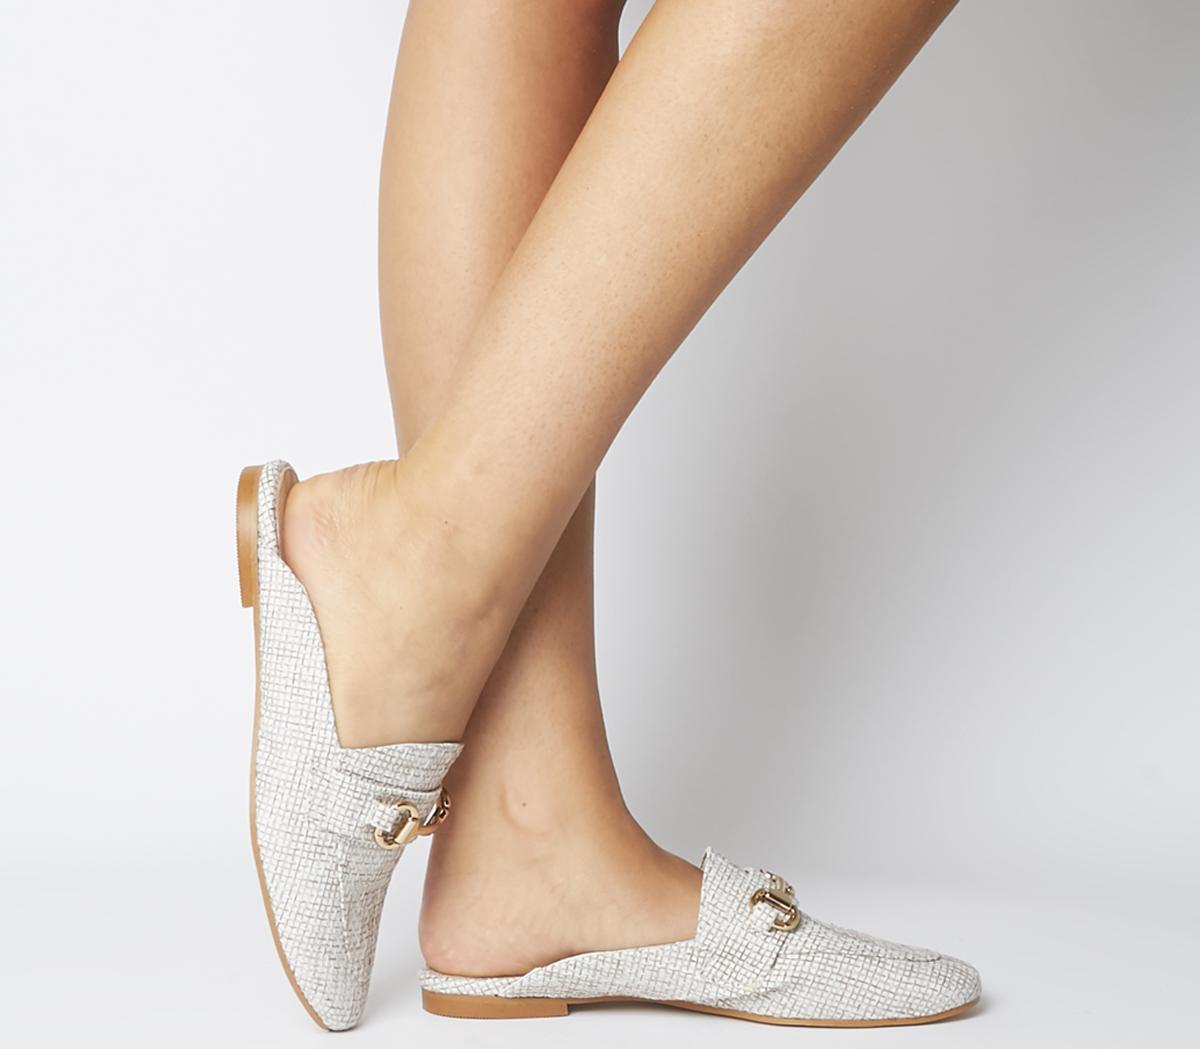 Fondness Mule Loafers